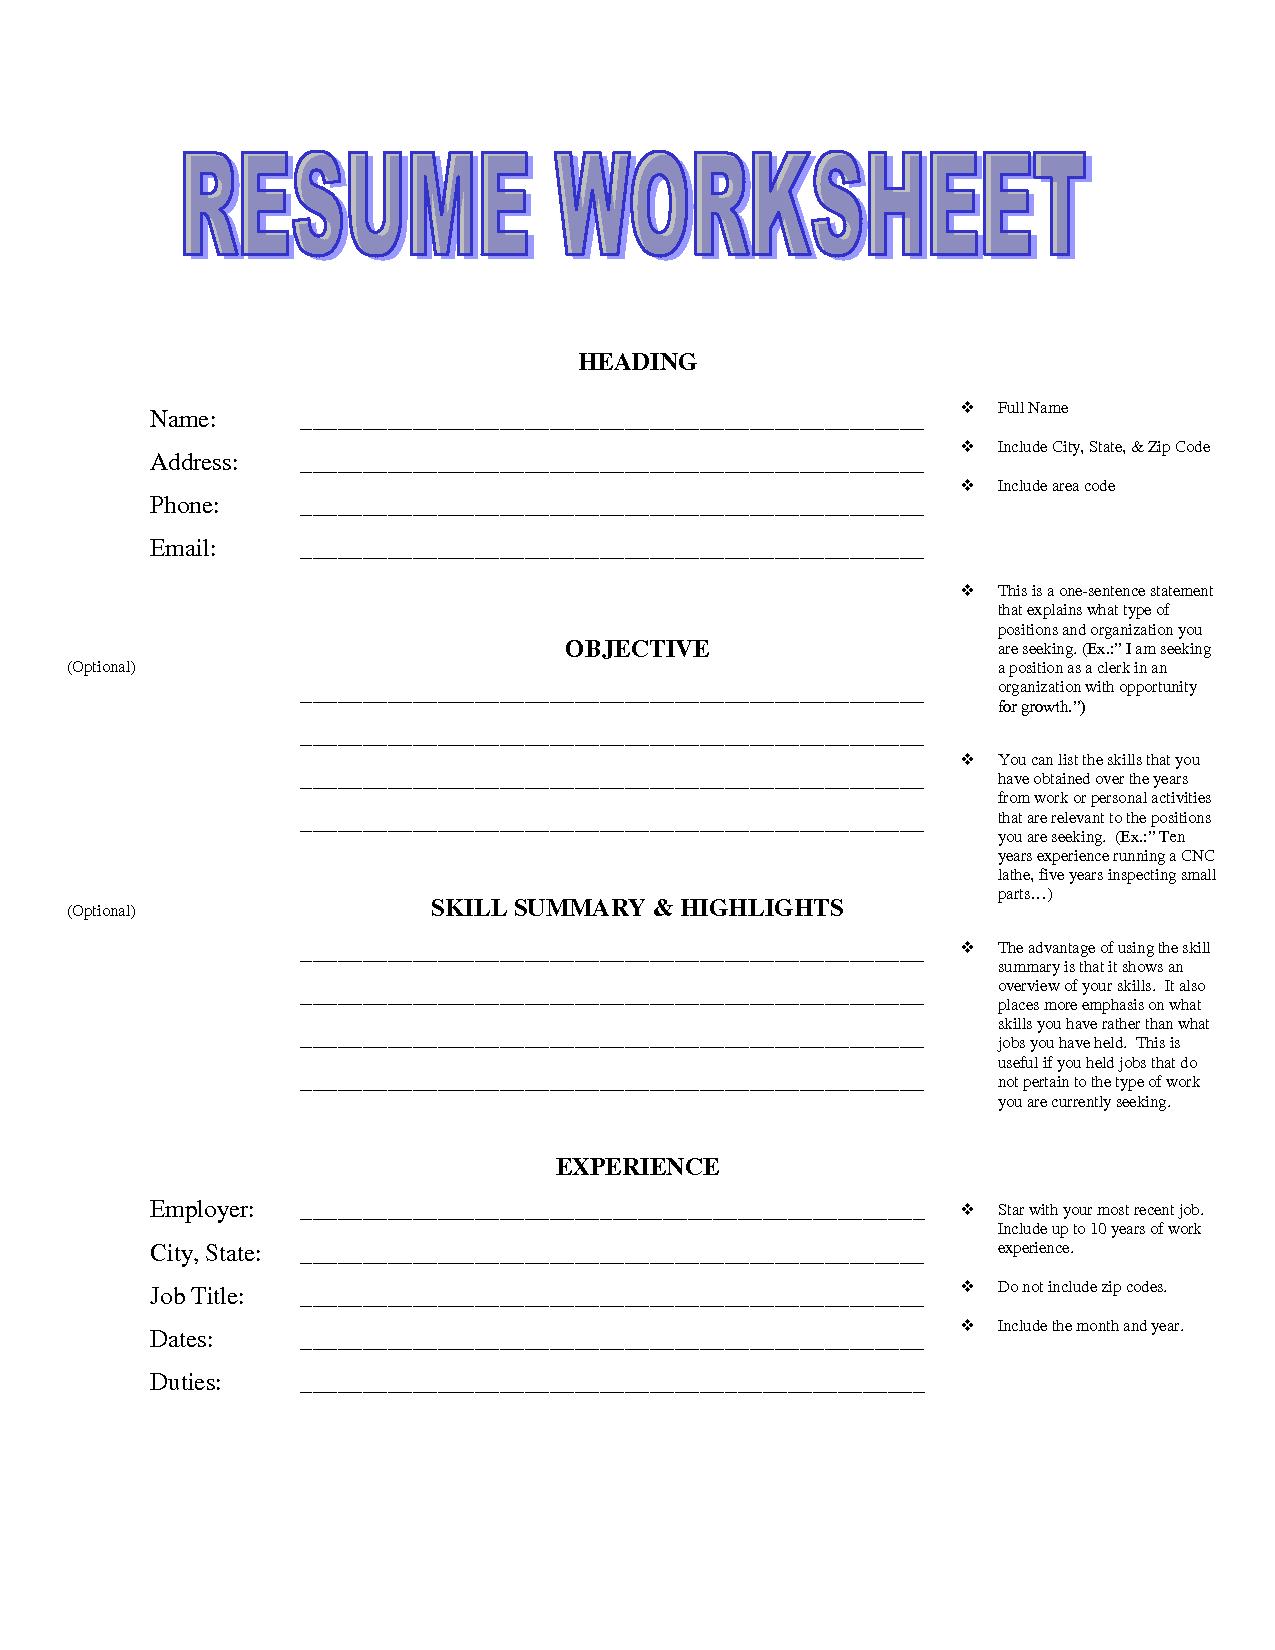 Https Images Search Yahoo Com Images View Job Resume Samples Free Printable Resume Job Resume